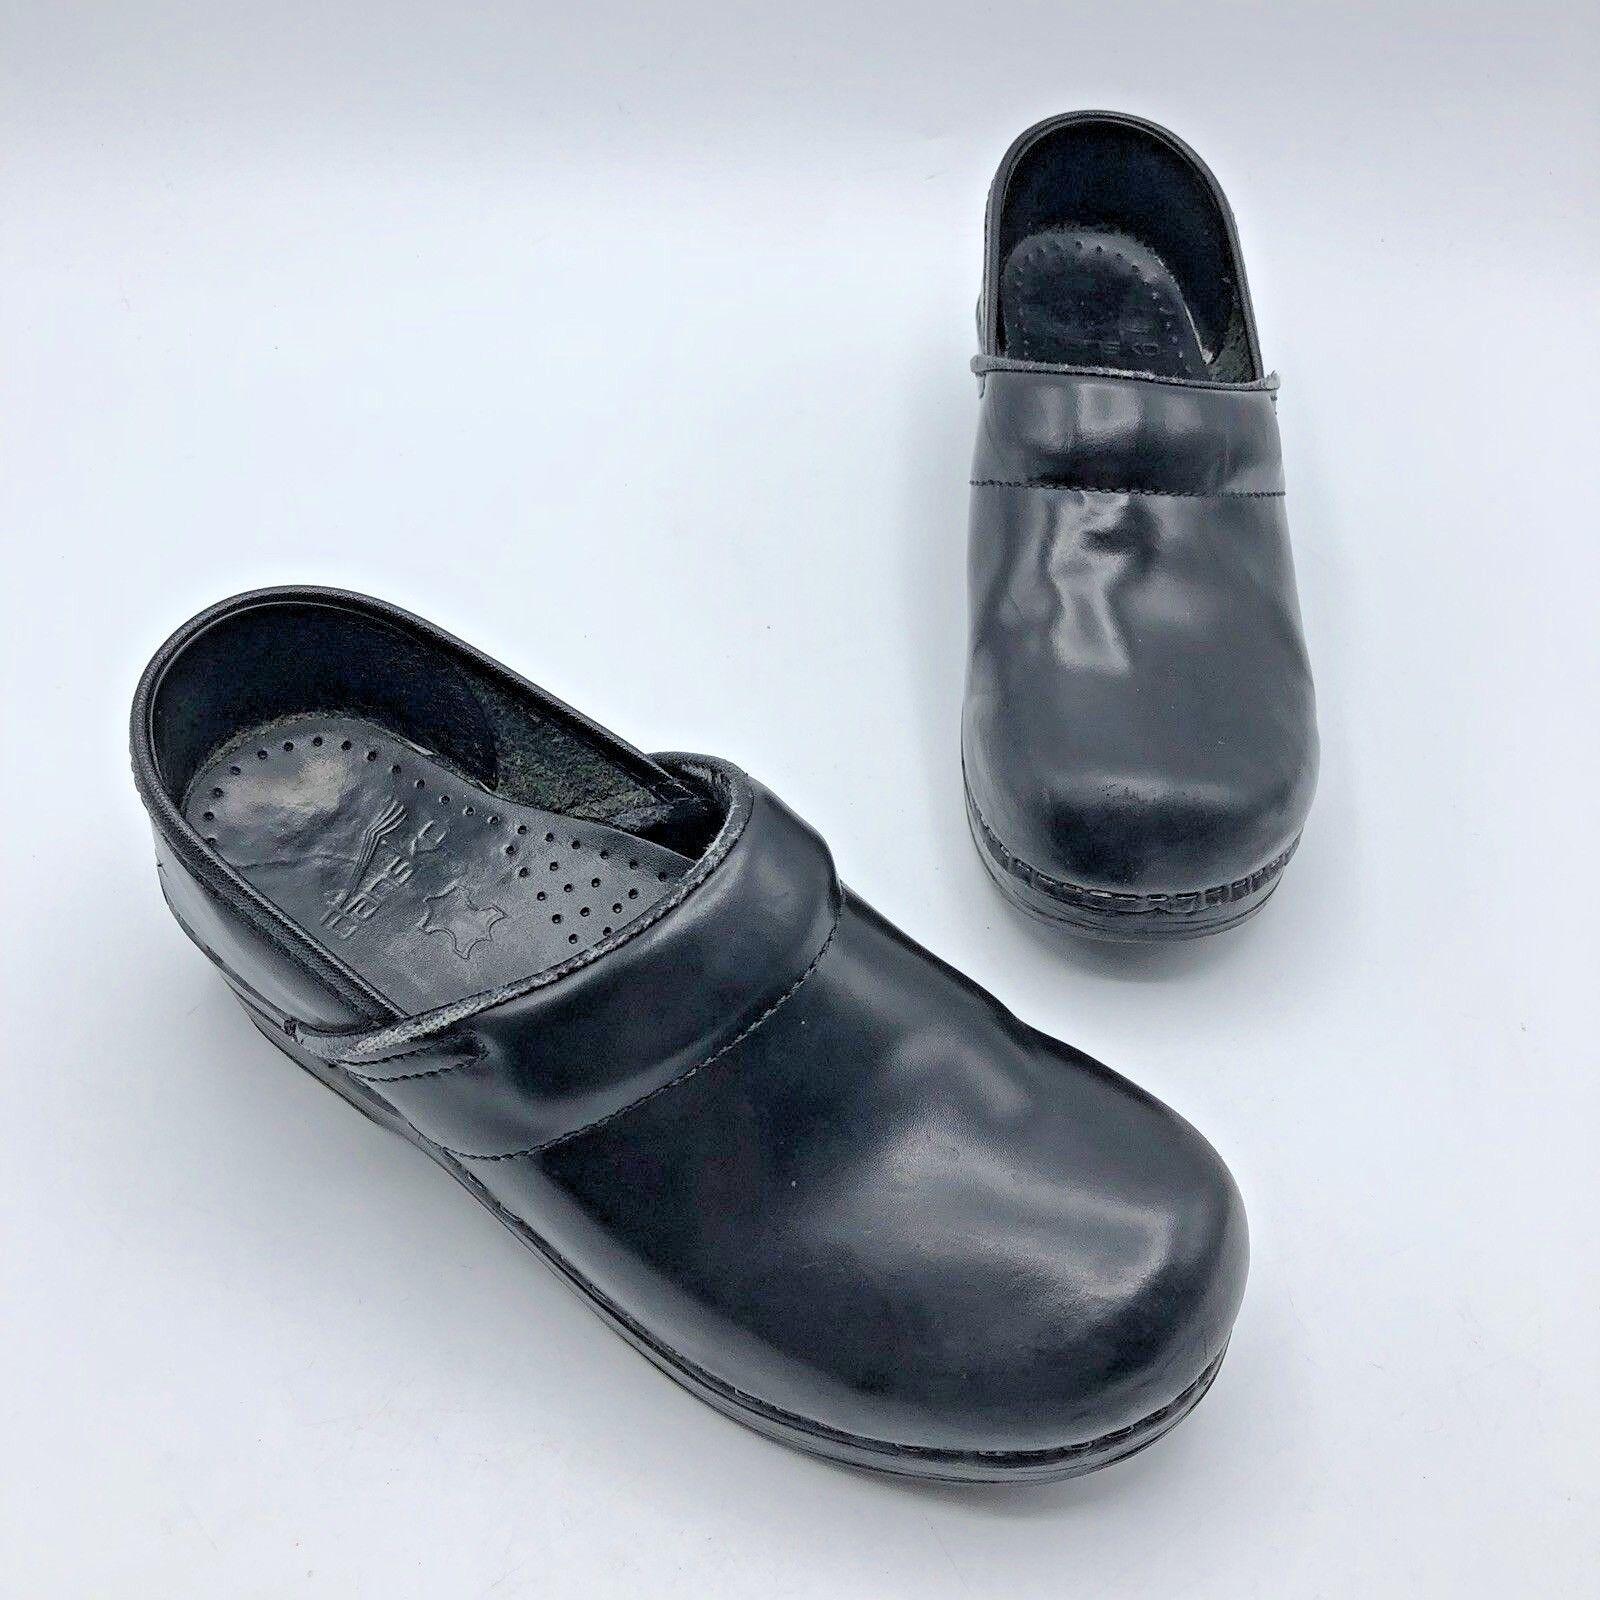 Dansko Women Black Leather Staple Clog Loafer shoes Size 5.5 EUR 36 Pre Owned